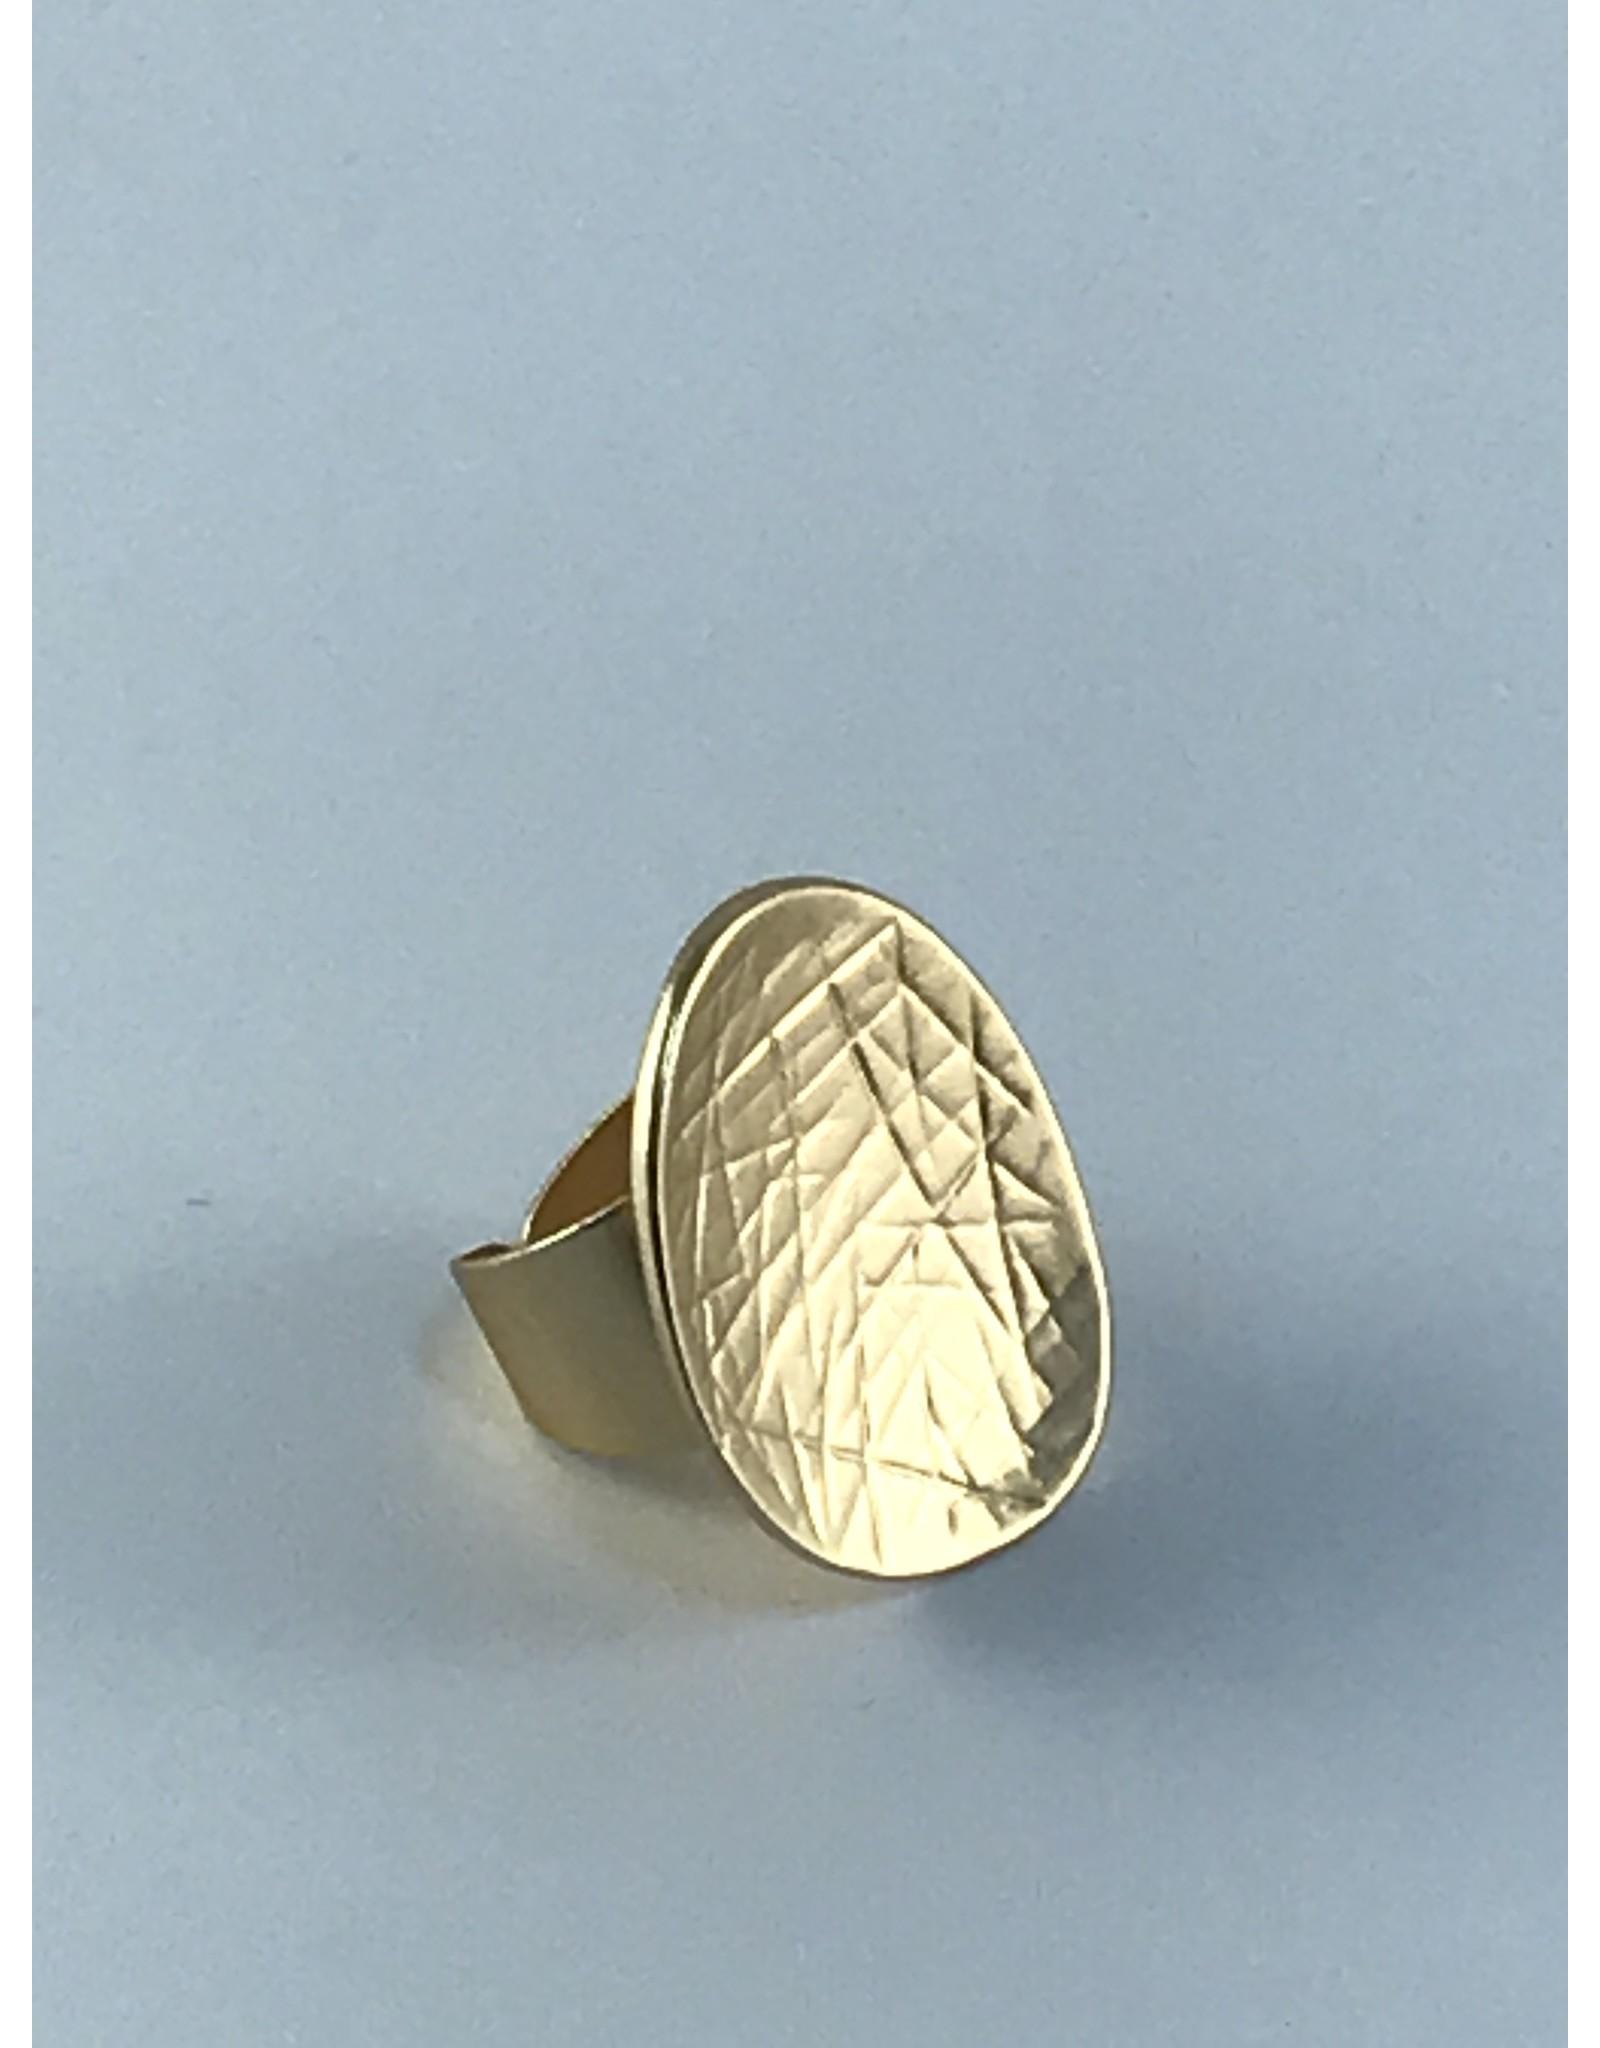 Axxes-Soir Ring - 1 maat - verstelbaar- goudkleurig - mat